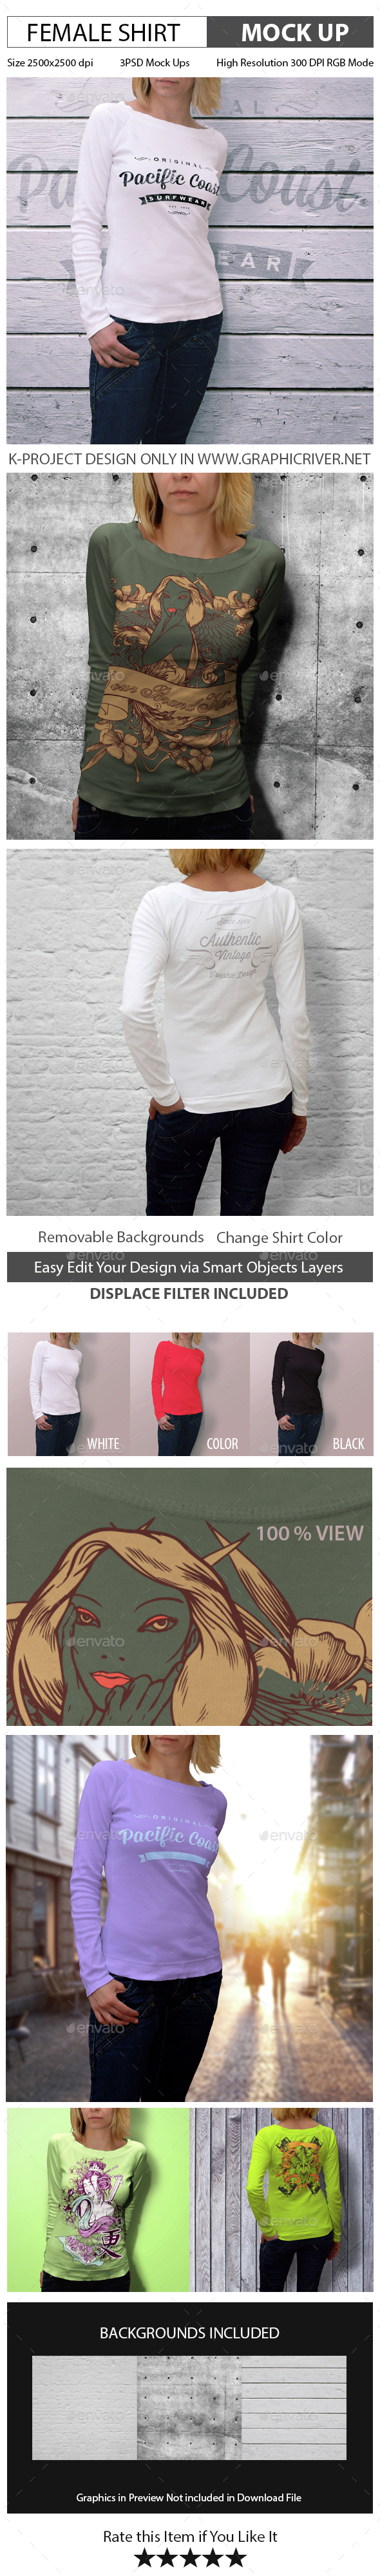 Female Shirt Mock Up - T-shirts Apparel